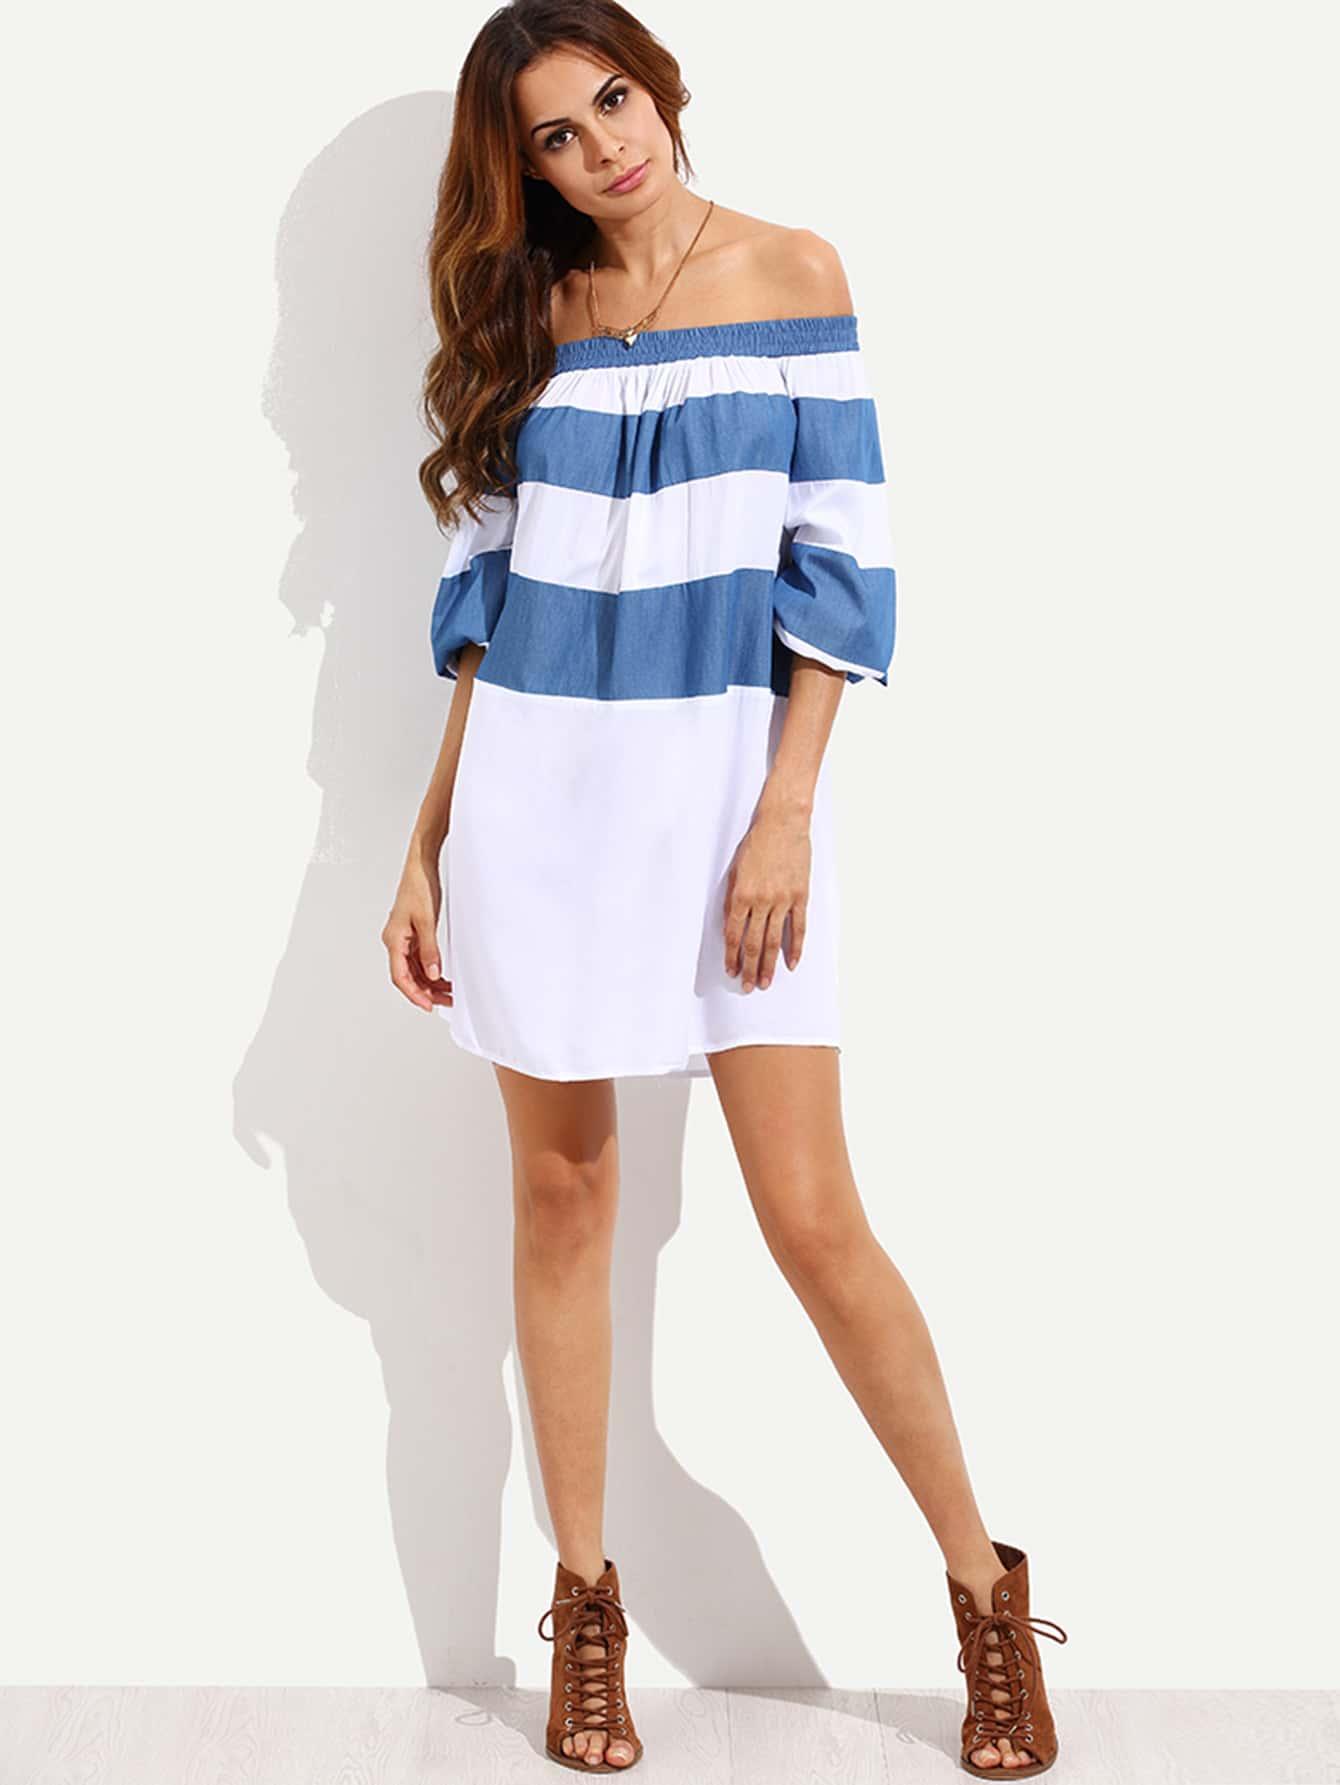 Colorblock Off The Shoulder Shift Dress dress160622504